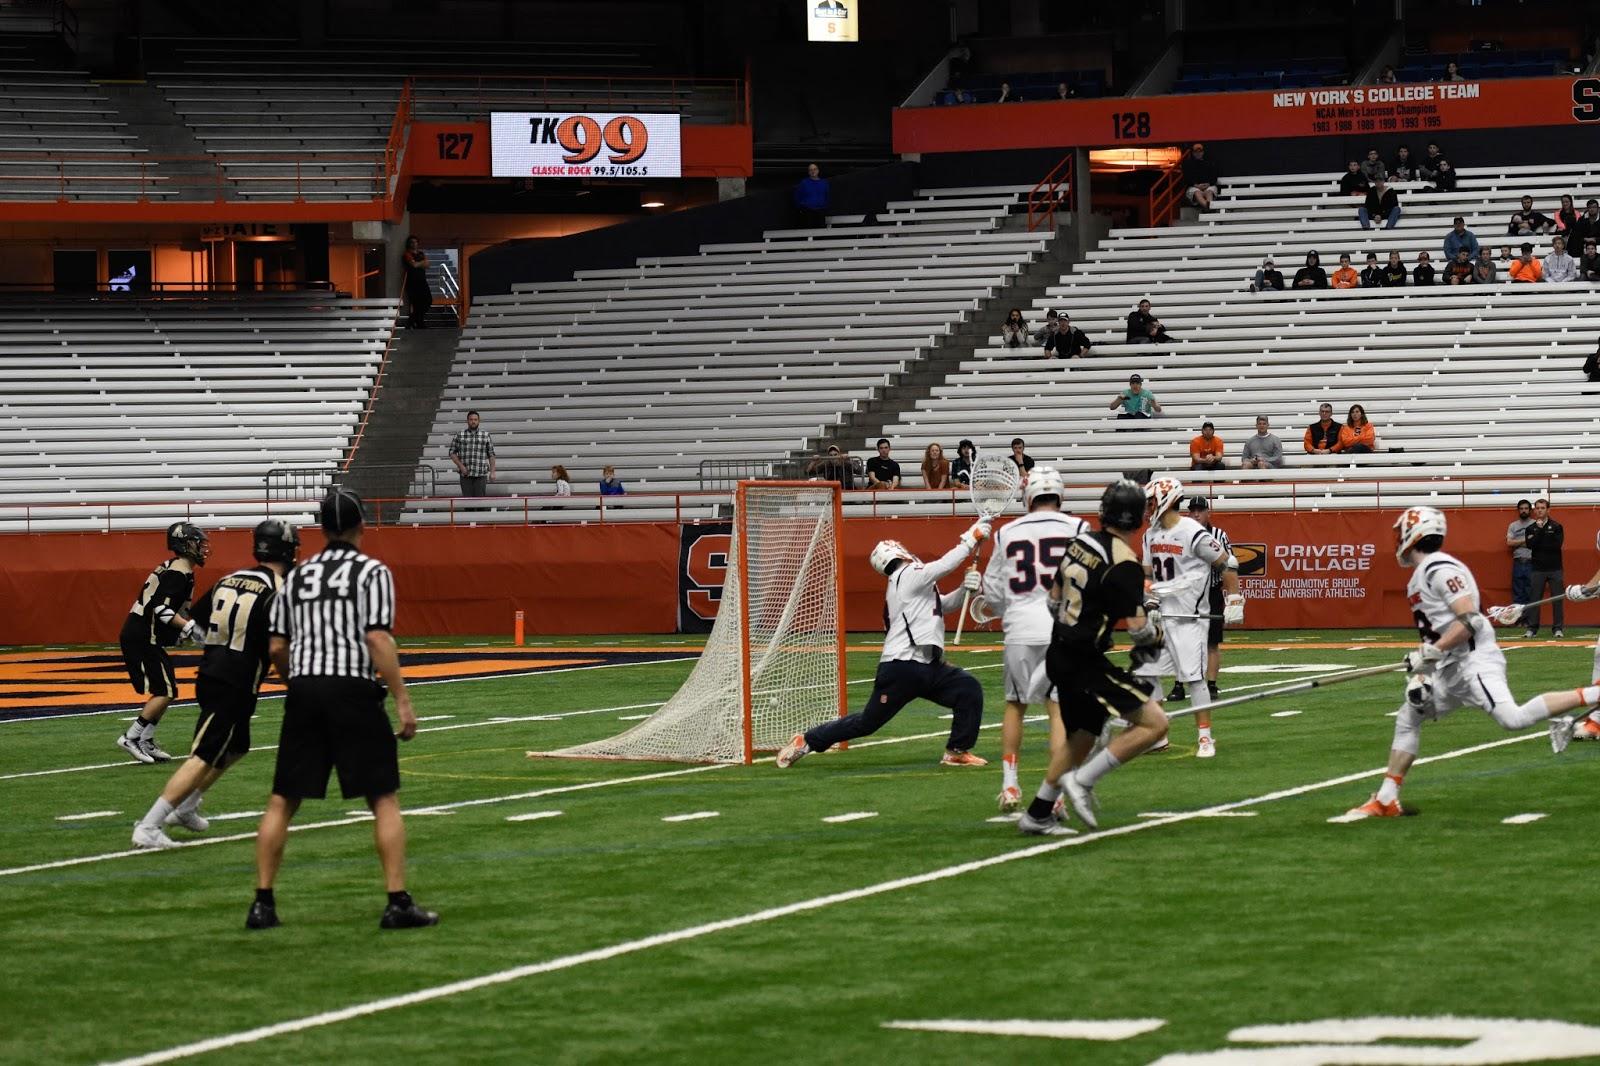 Black Knights Beat Orange Men with Last-second Goal